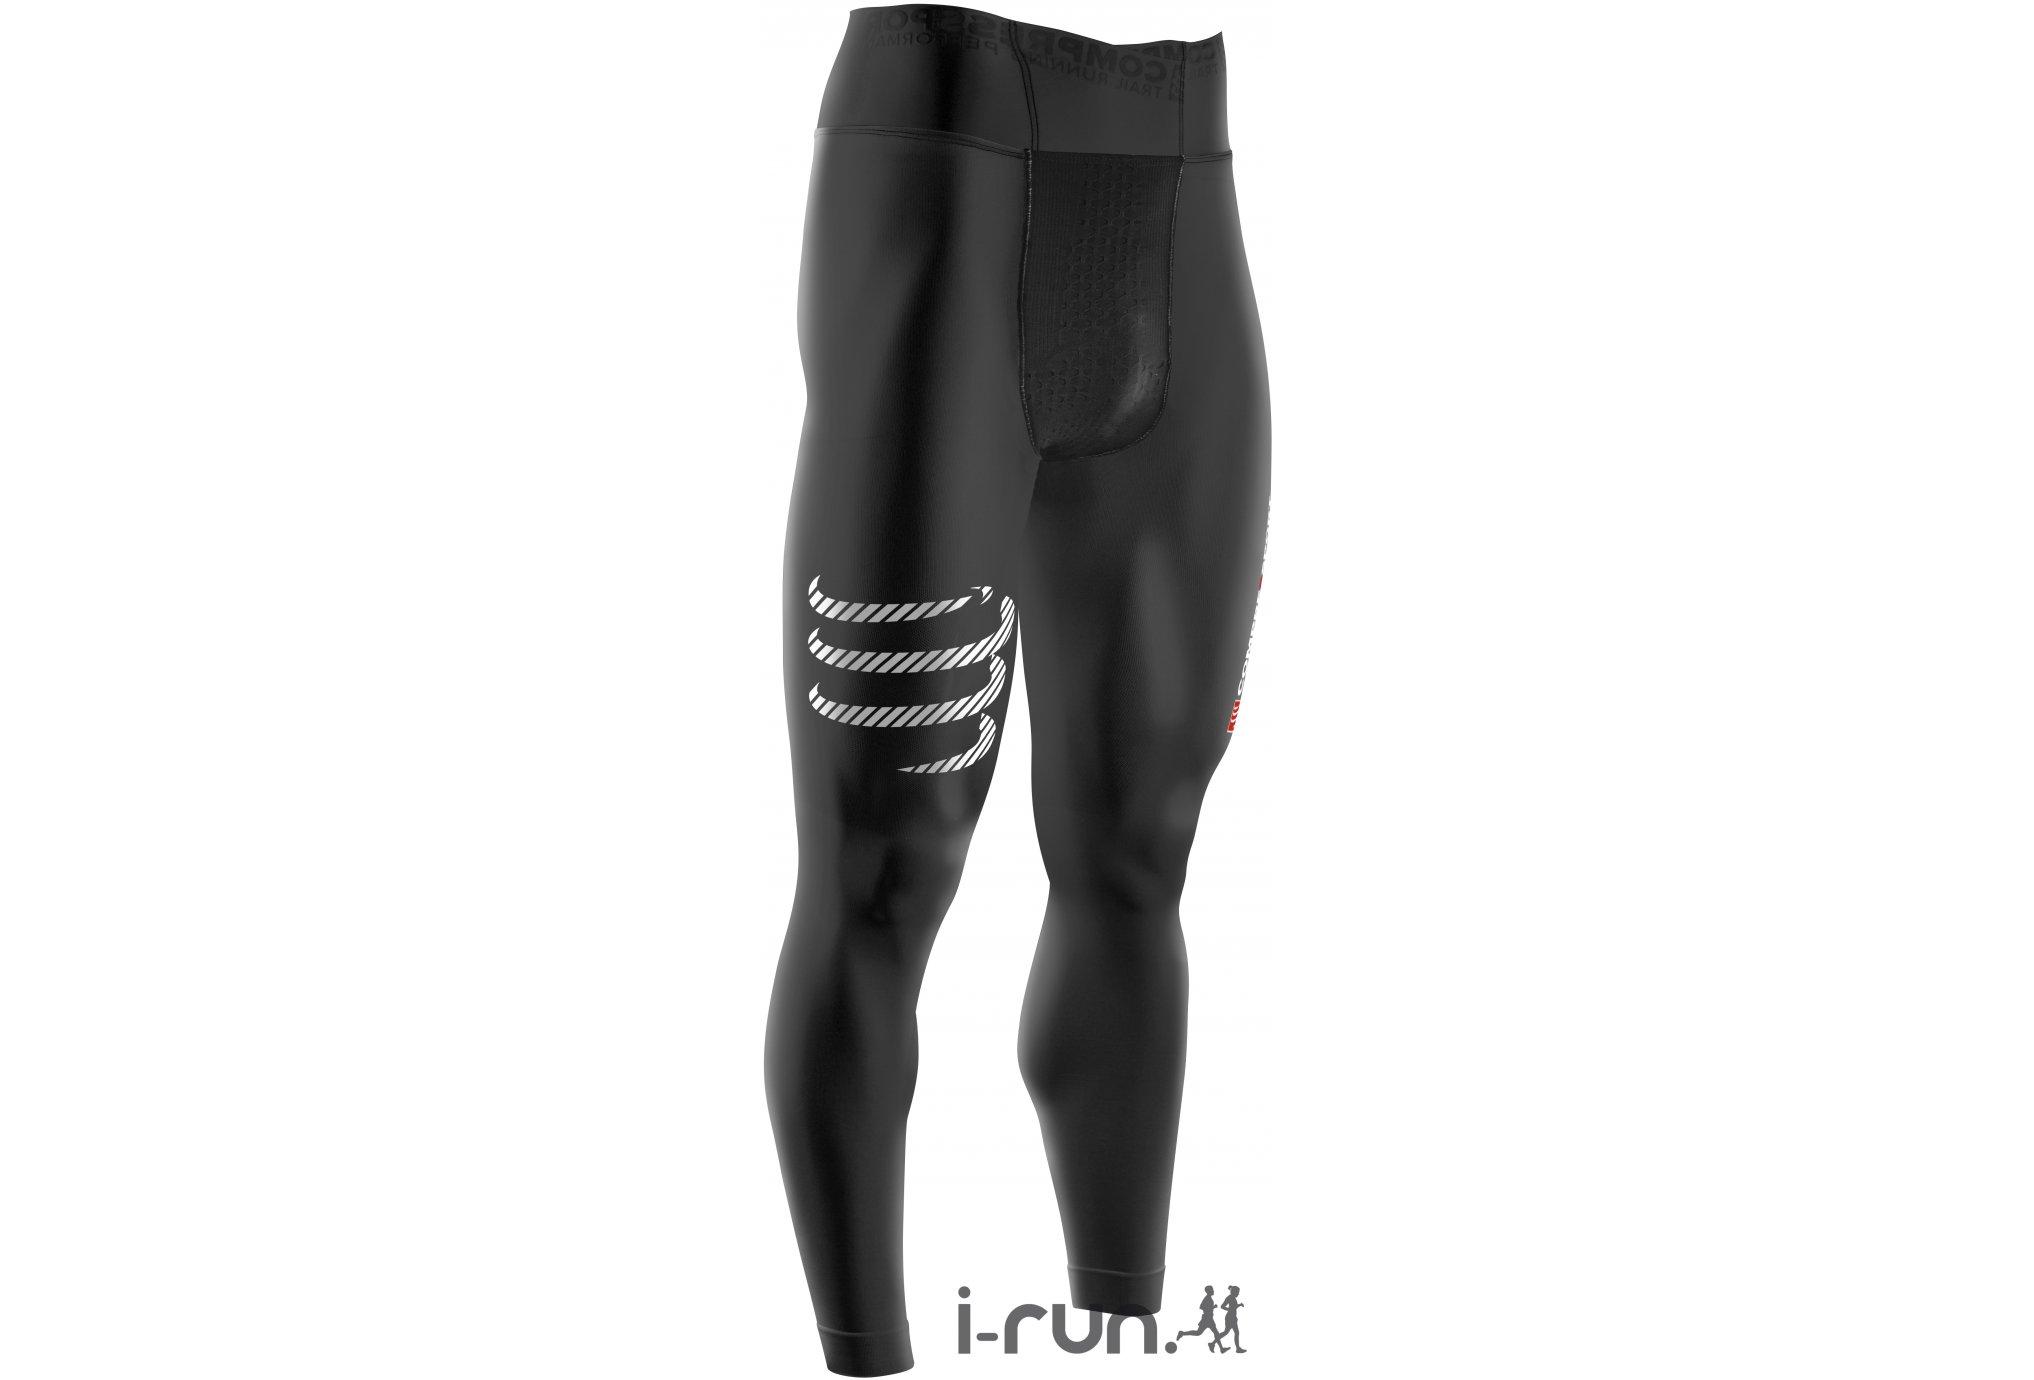 Compressport Full Tights M vêtement running homme